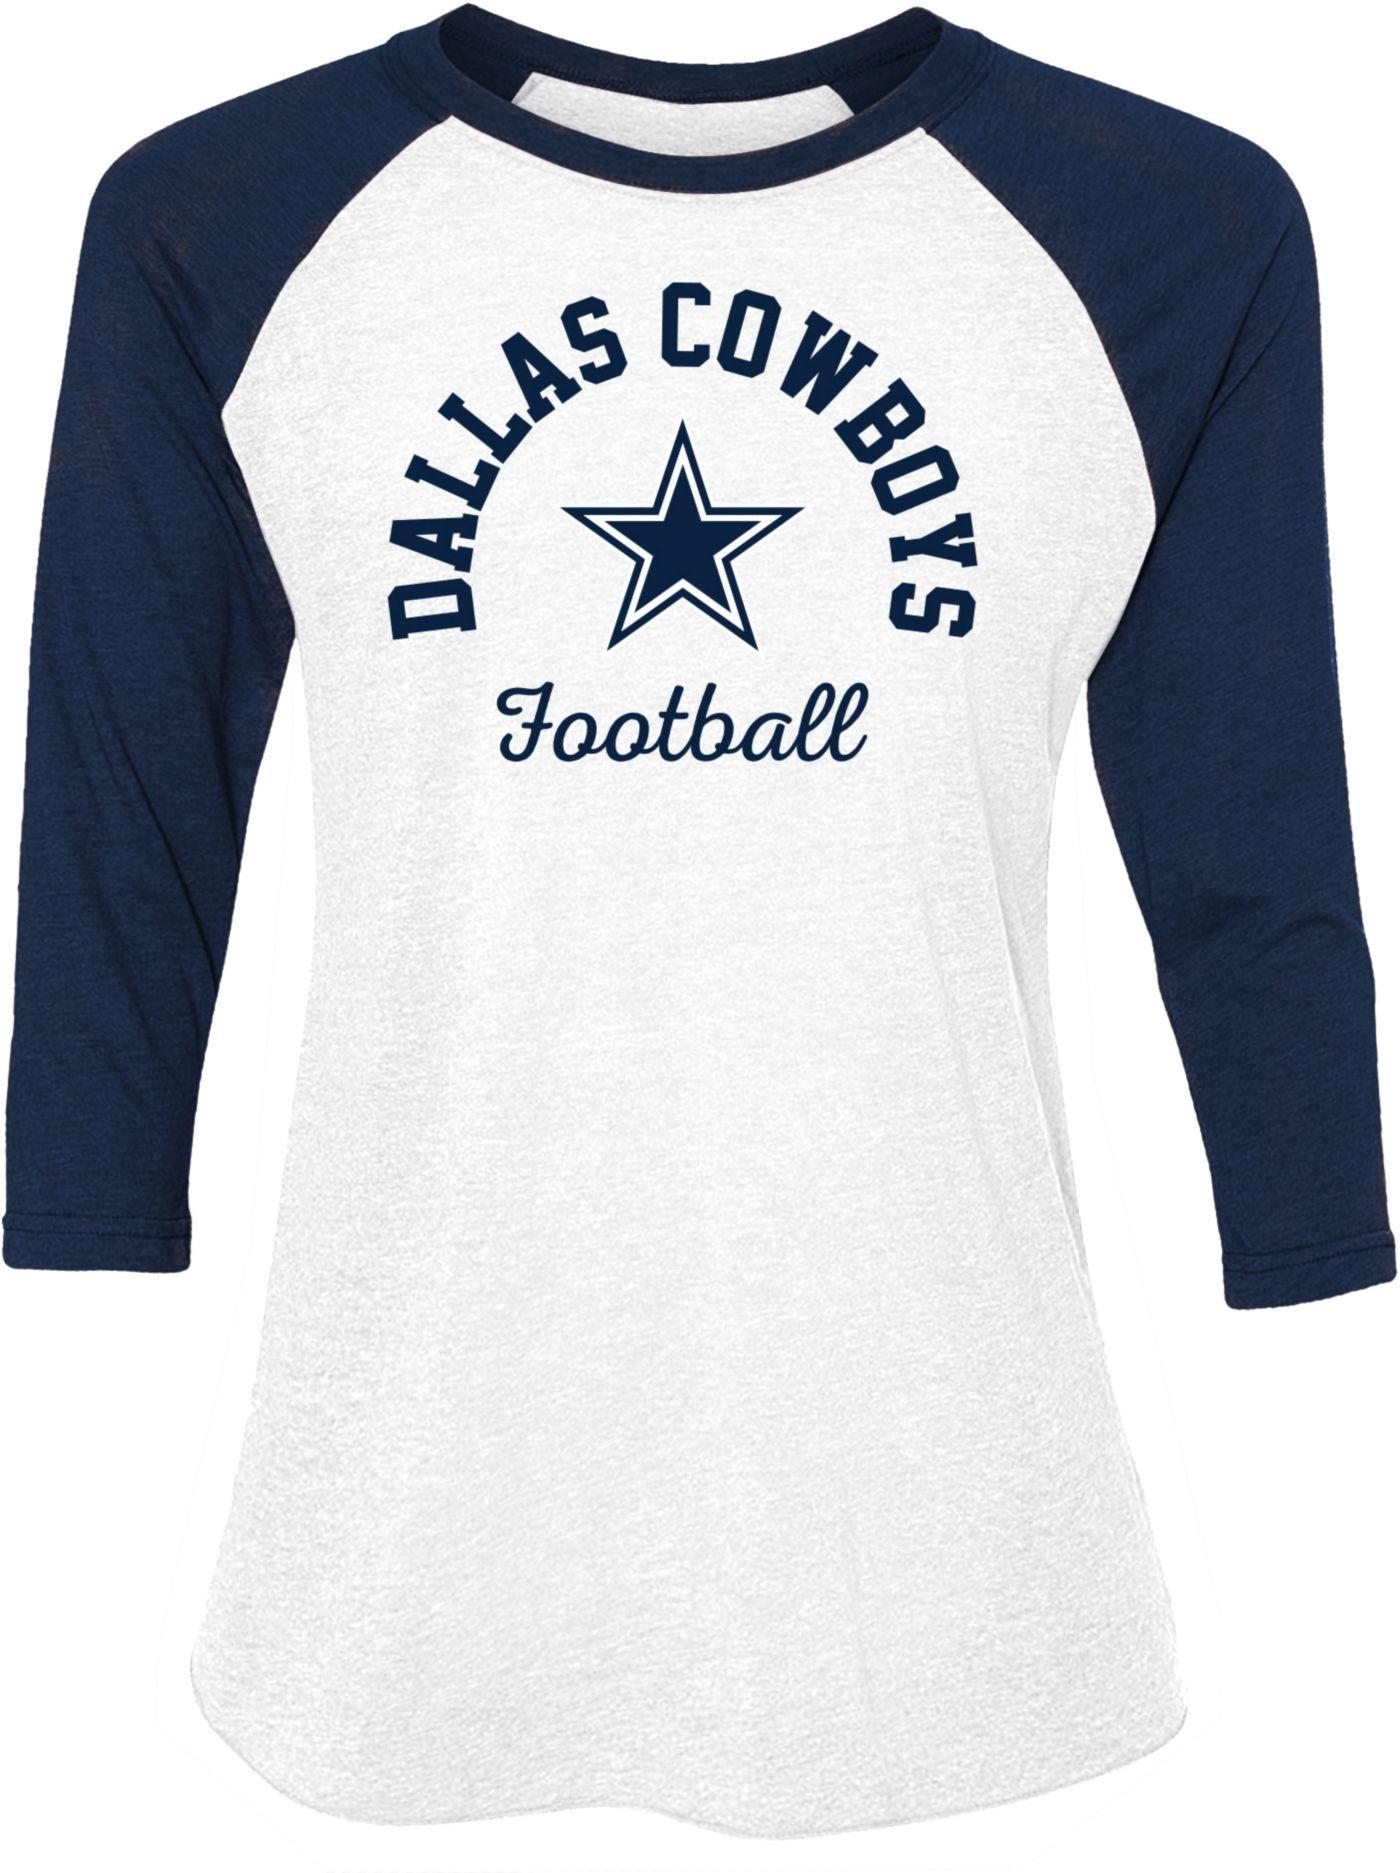 Dallas Cowboys Merchandising Women's Lorena White Raglan Shirt